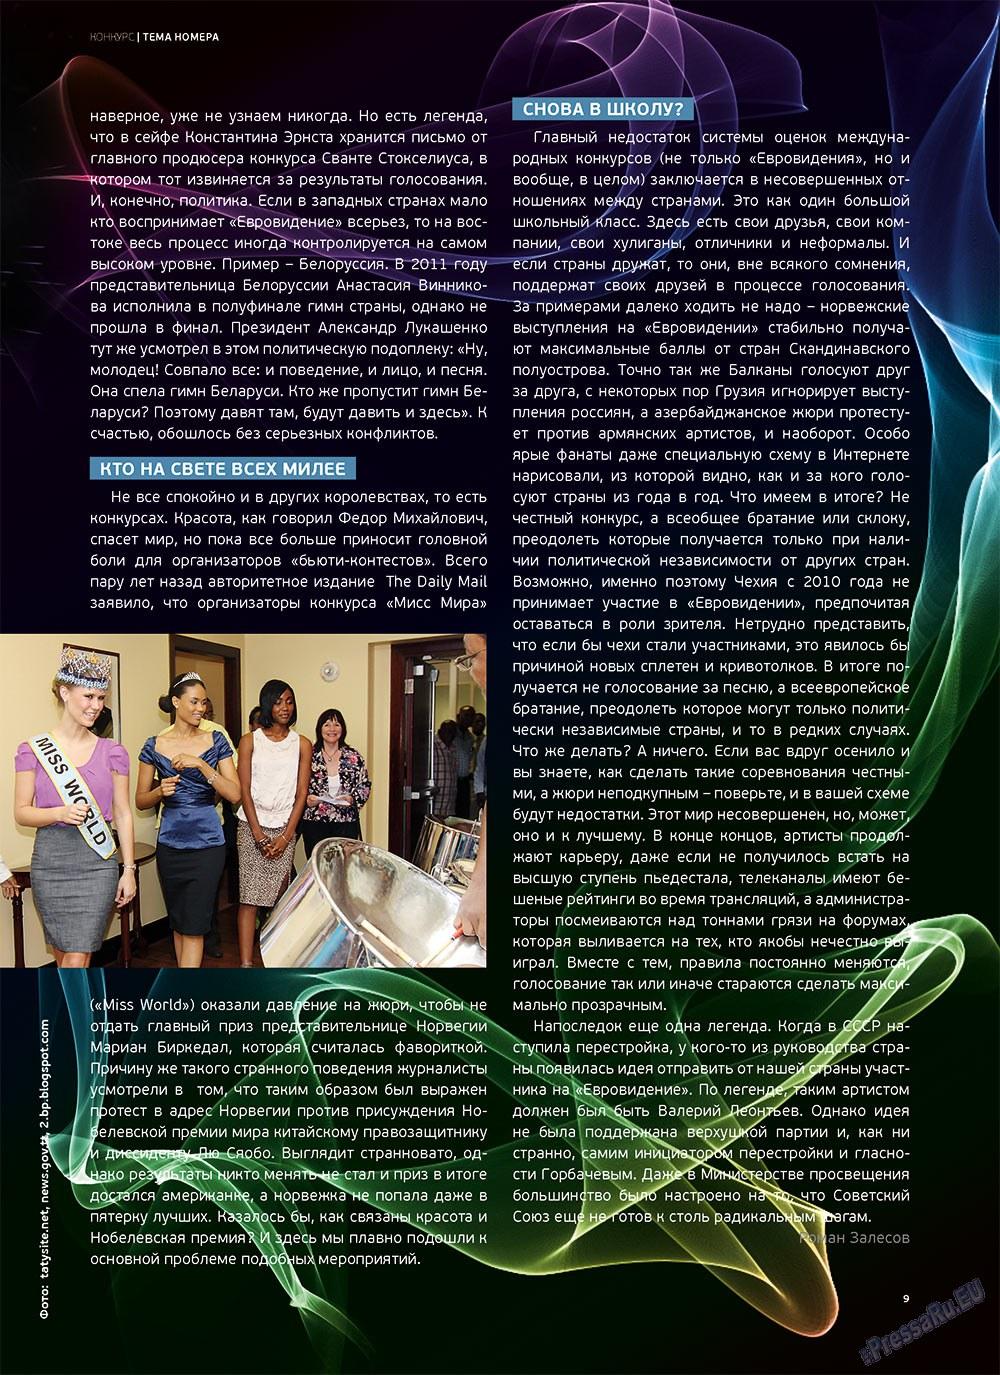 Артек (журнал). 2012 год, номер 5, стр. 11